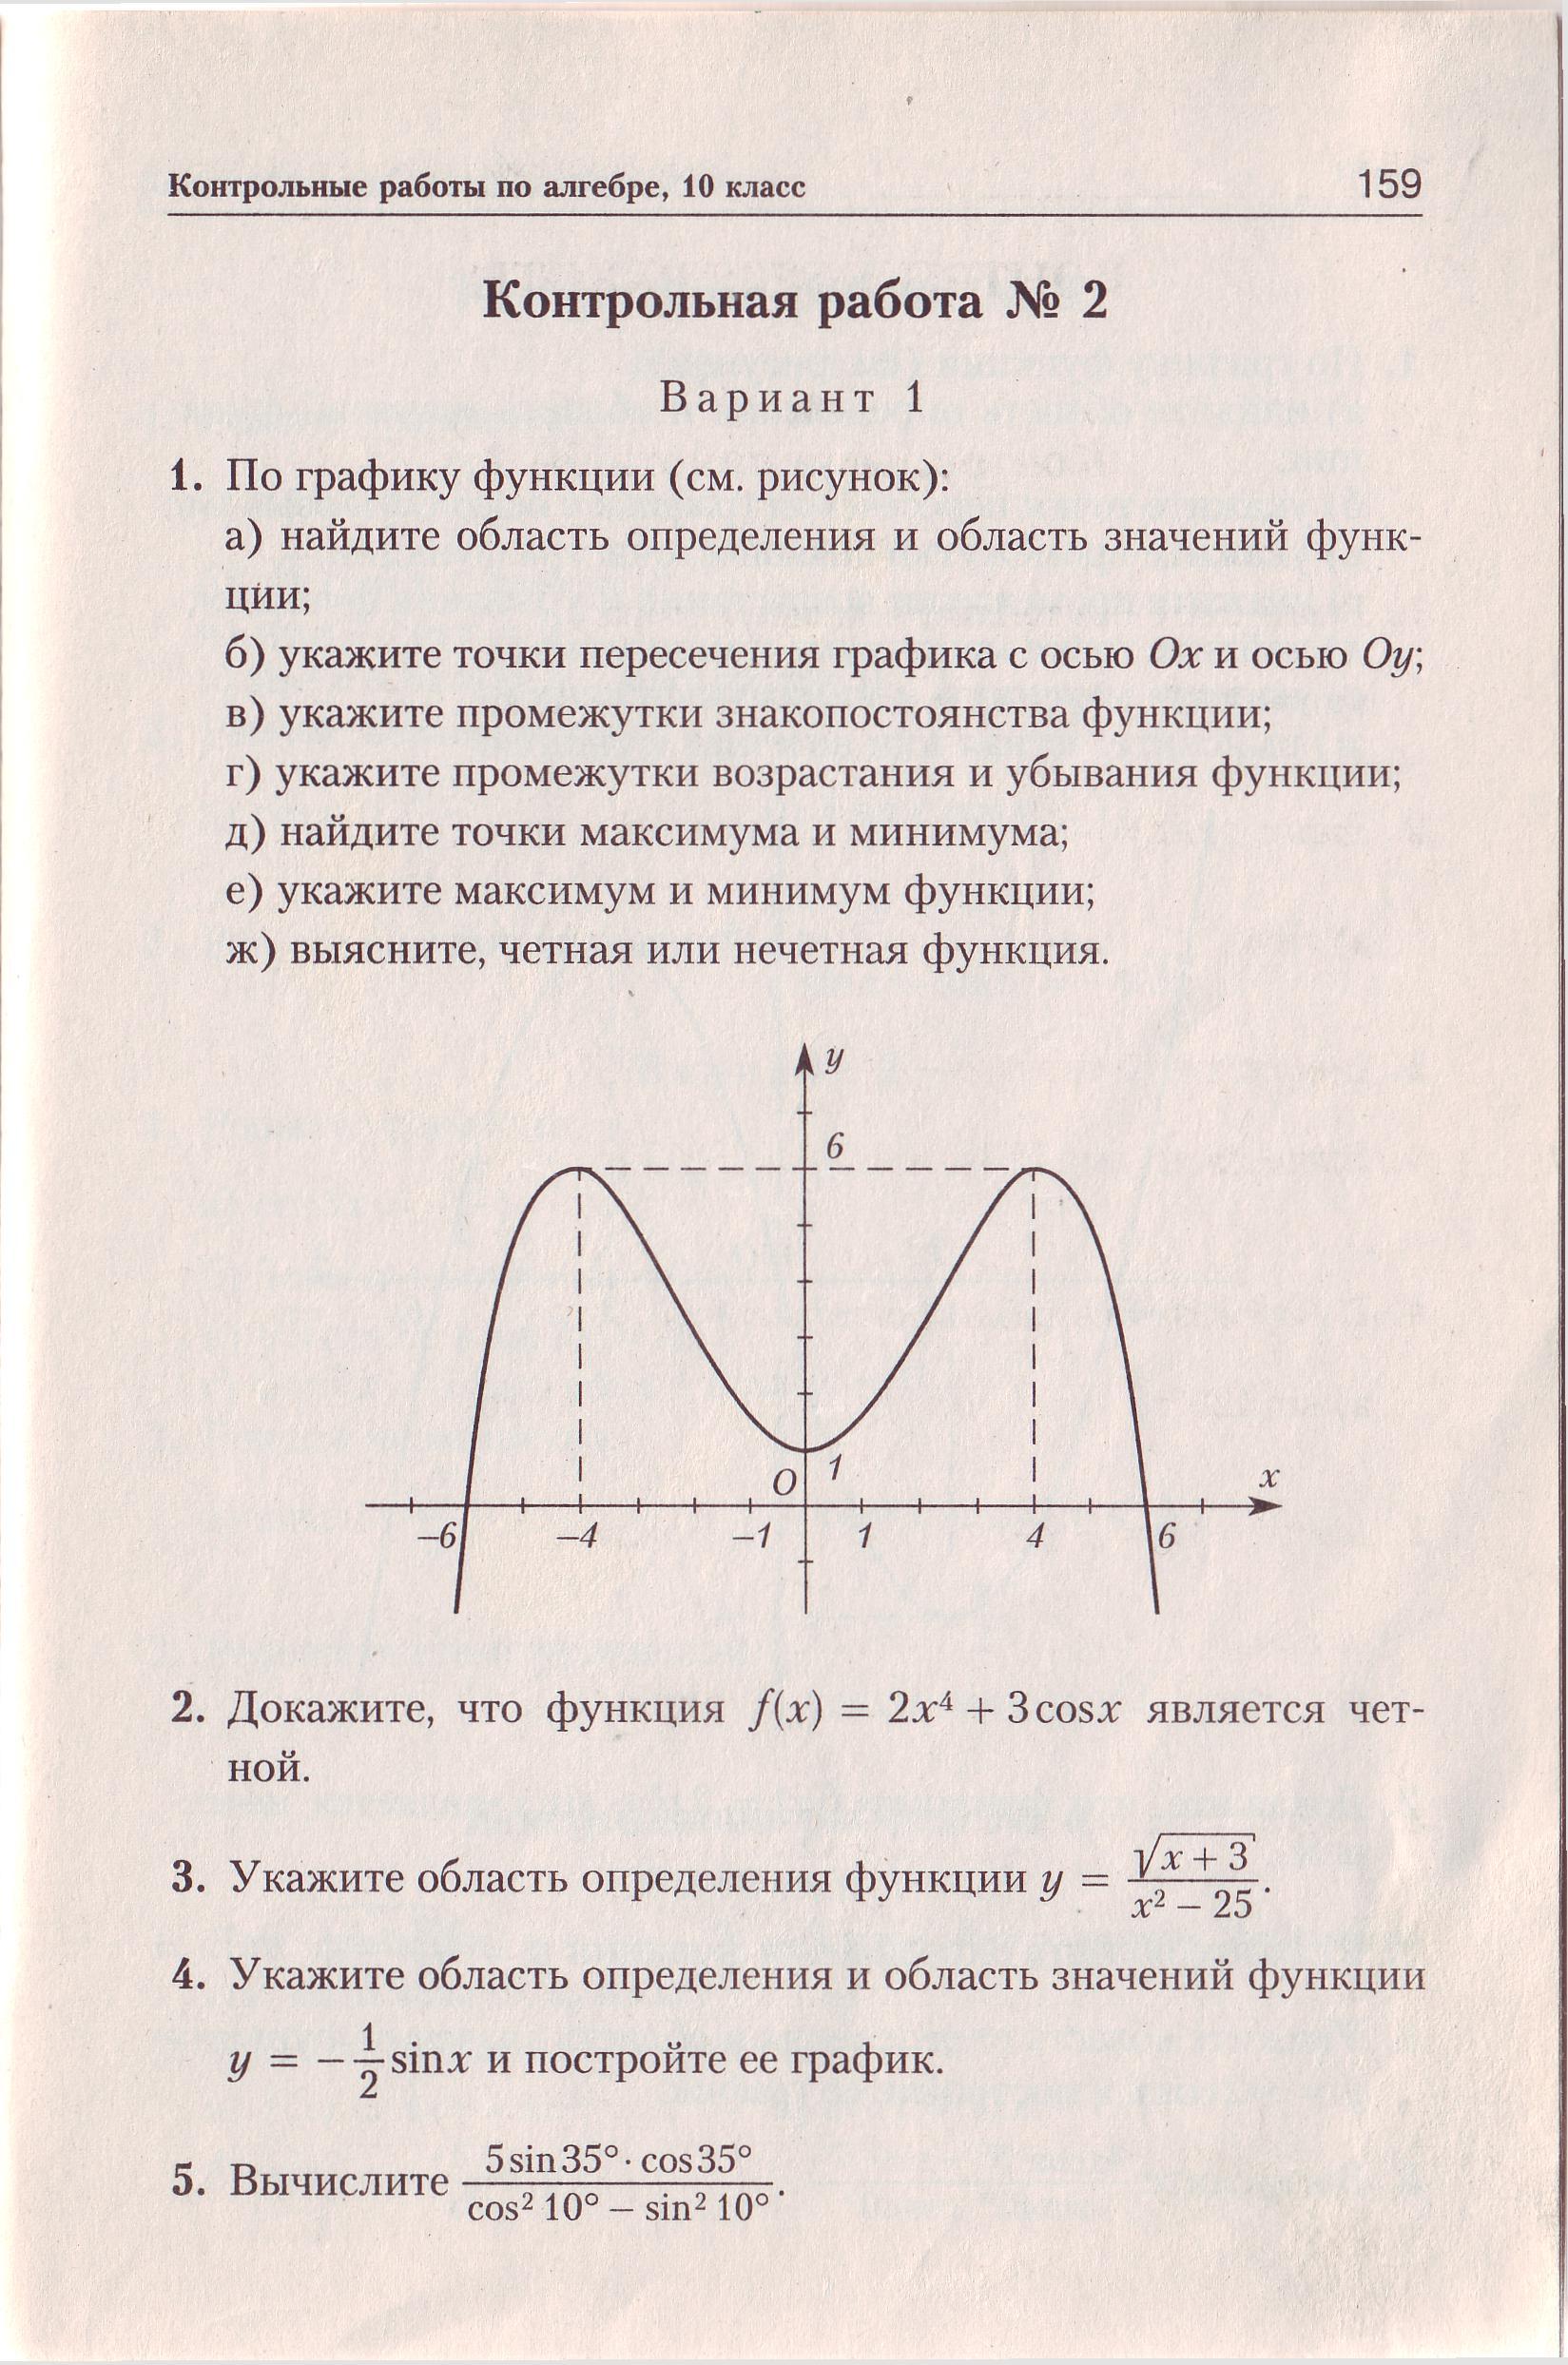 Рабочая программа по алгебре класс А Н Колмогоров  hello html m57ee1ebf jpg hello html 541ece31 jpg